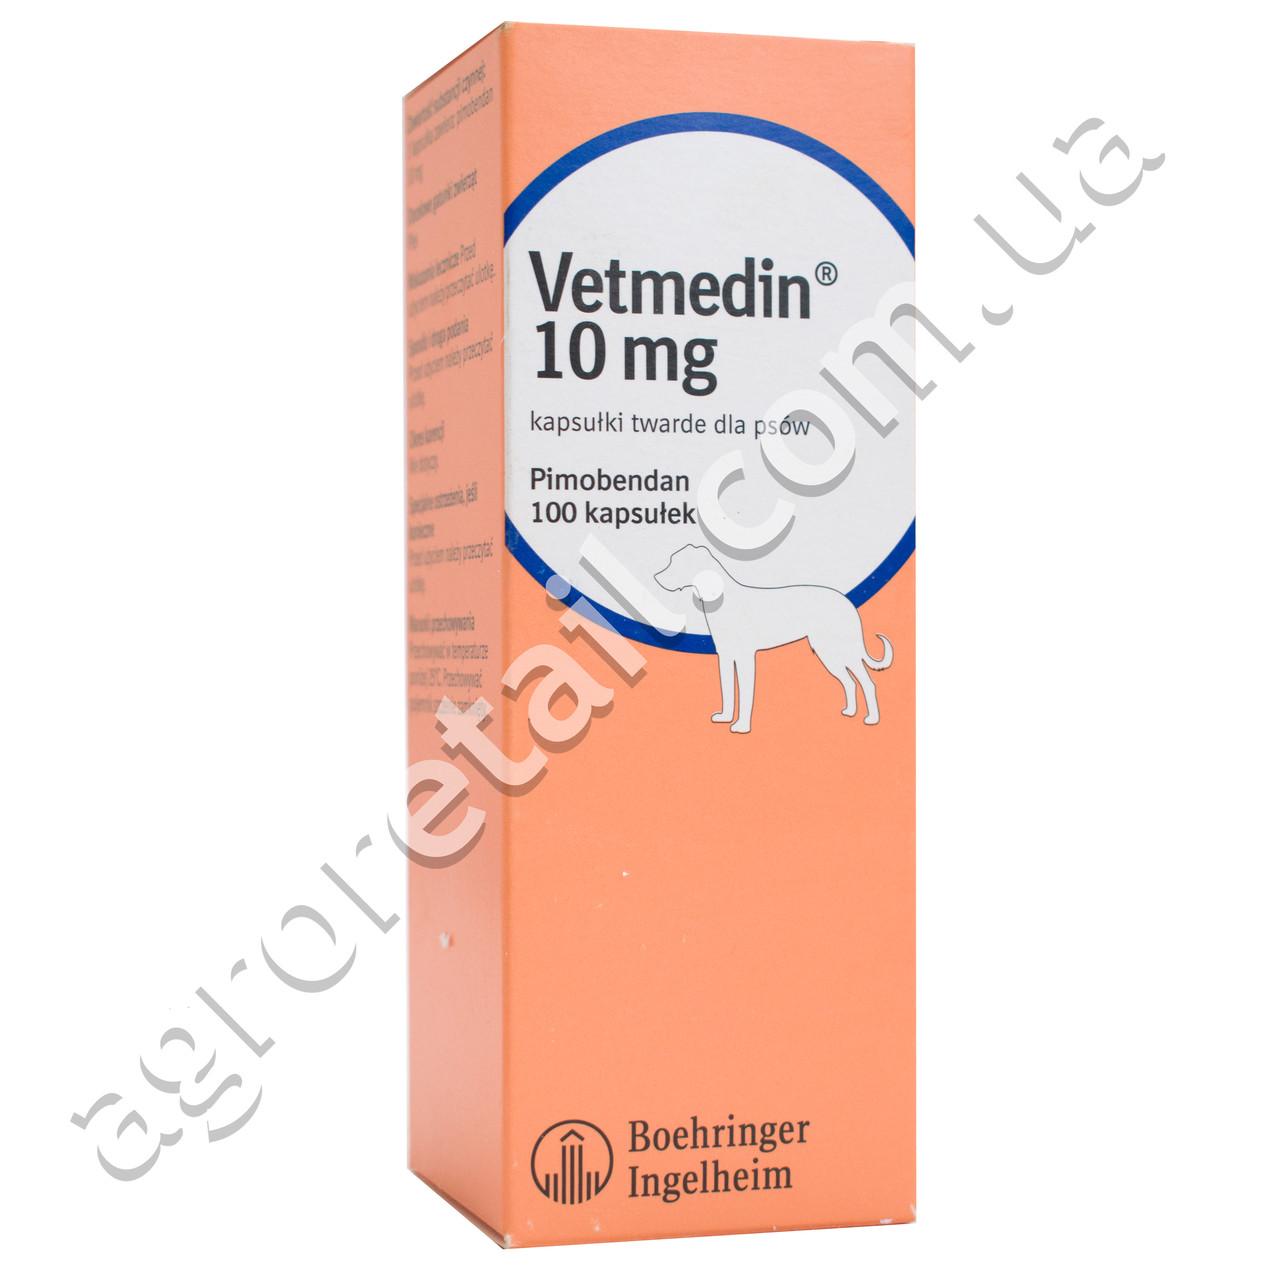 Ветмедин 10 мг 100 капсул